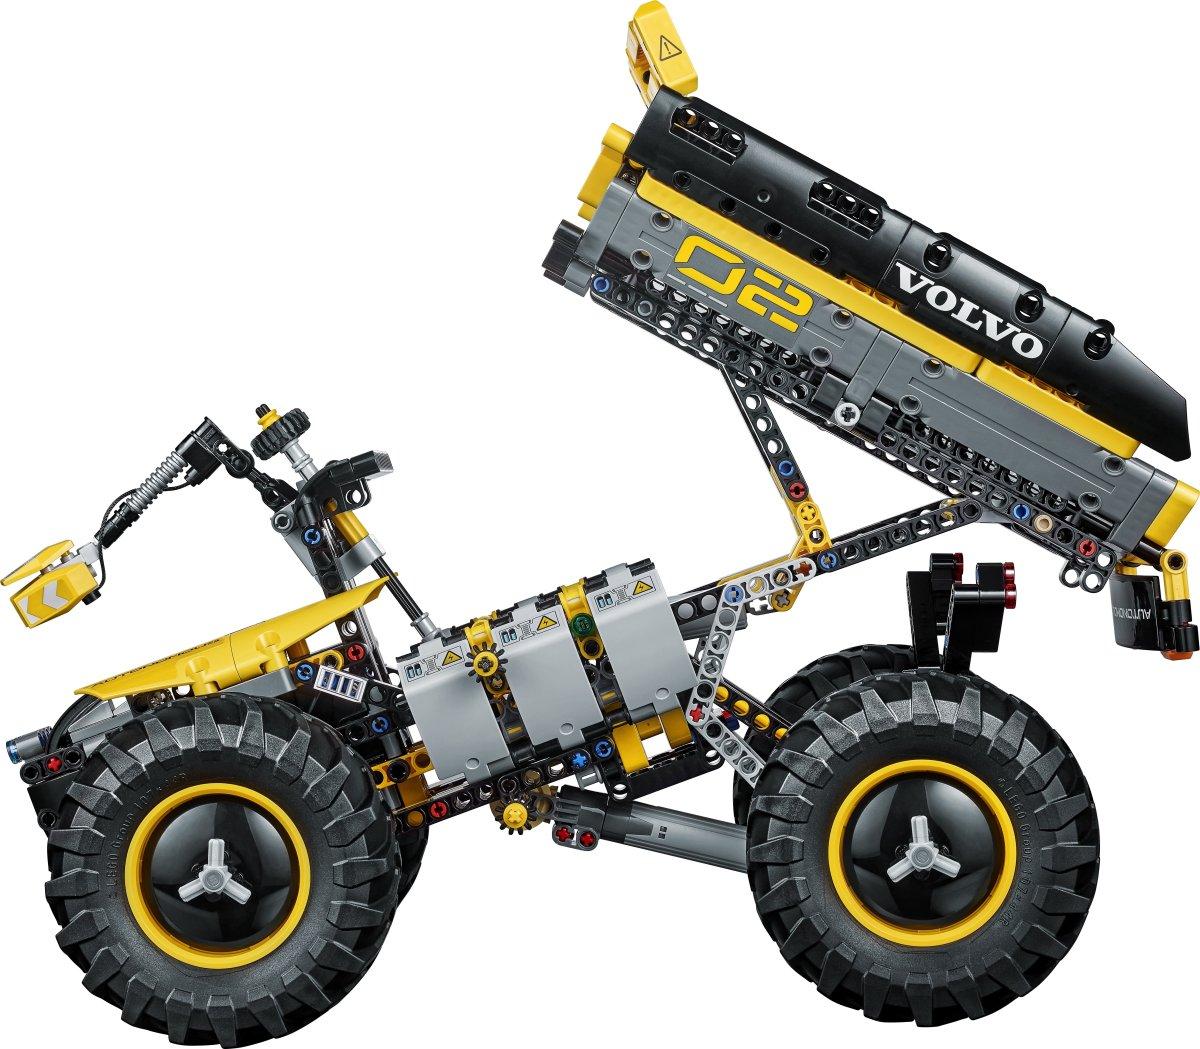 LEGO Technic 42081 Volvo Gummiged ZEUX, 10-16 år